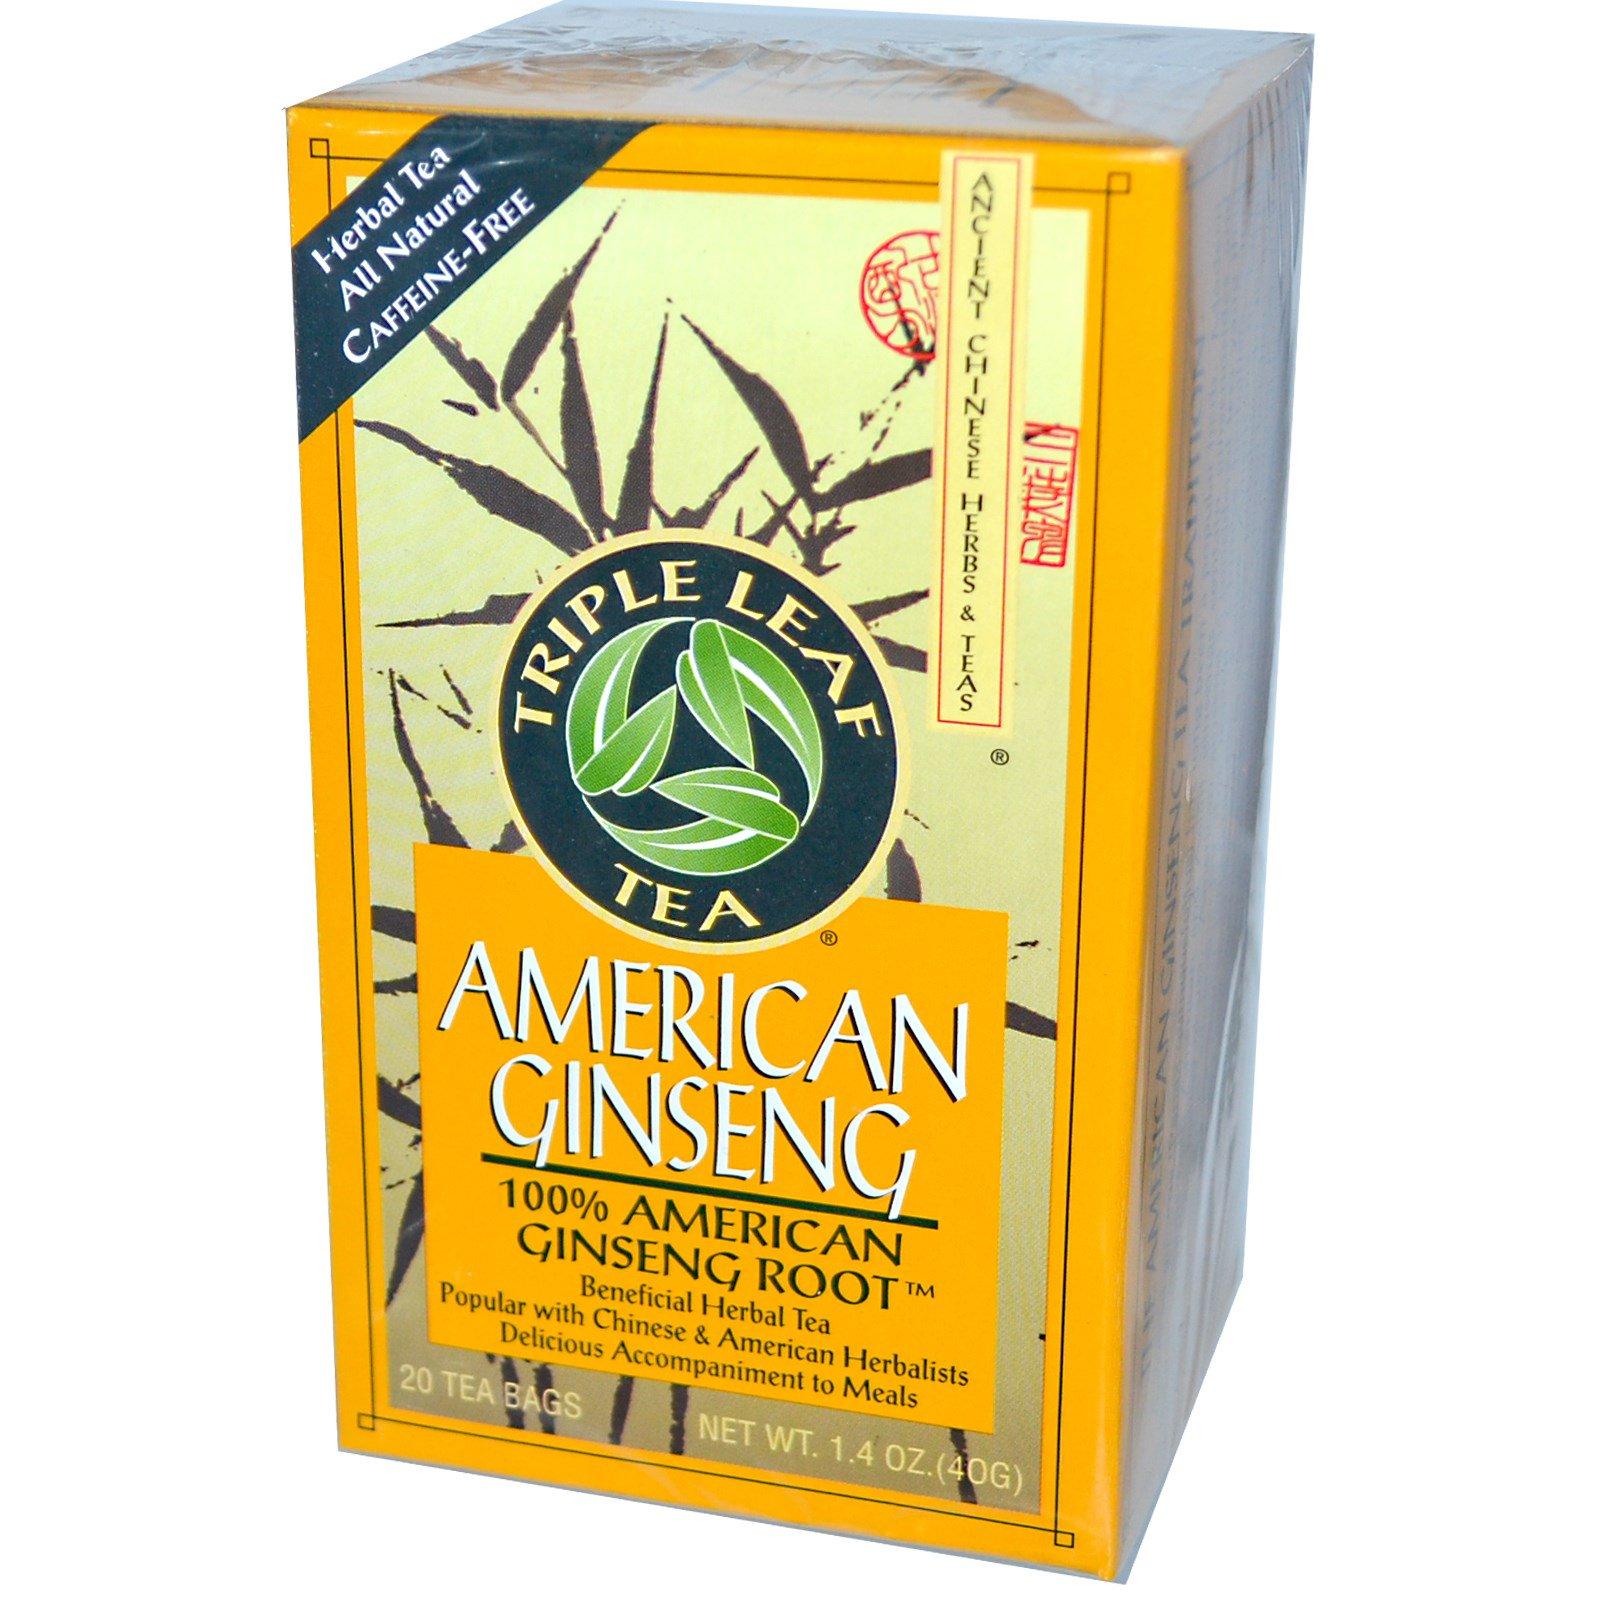 Triple Leaf Tea, Американский женьшень, без кофеина, 20 пакетиков, 1,4 унции (40 г)